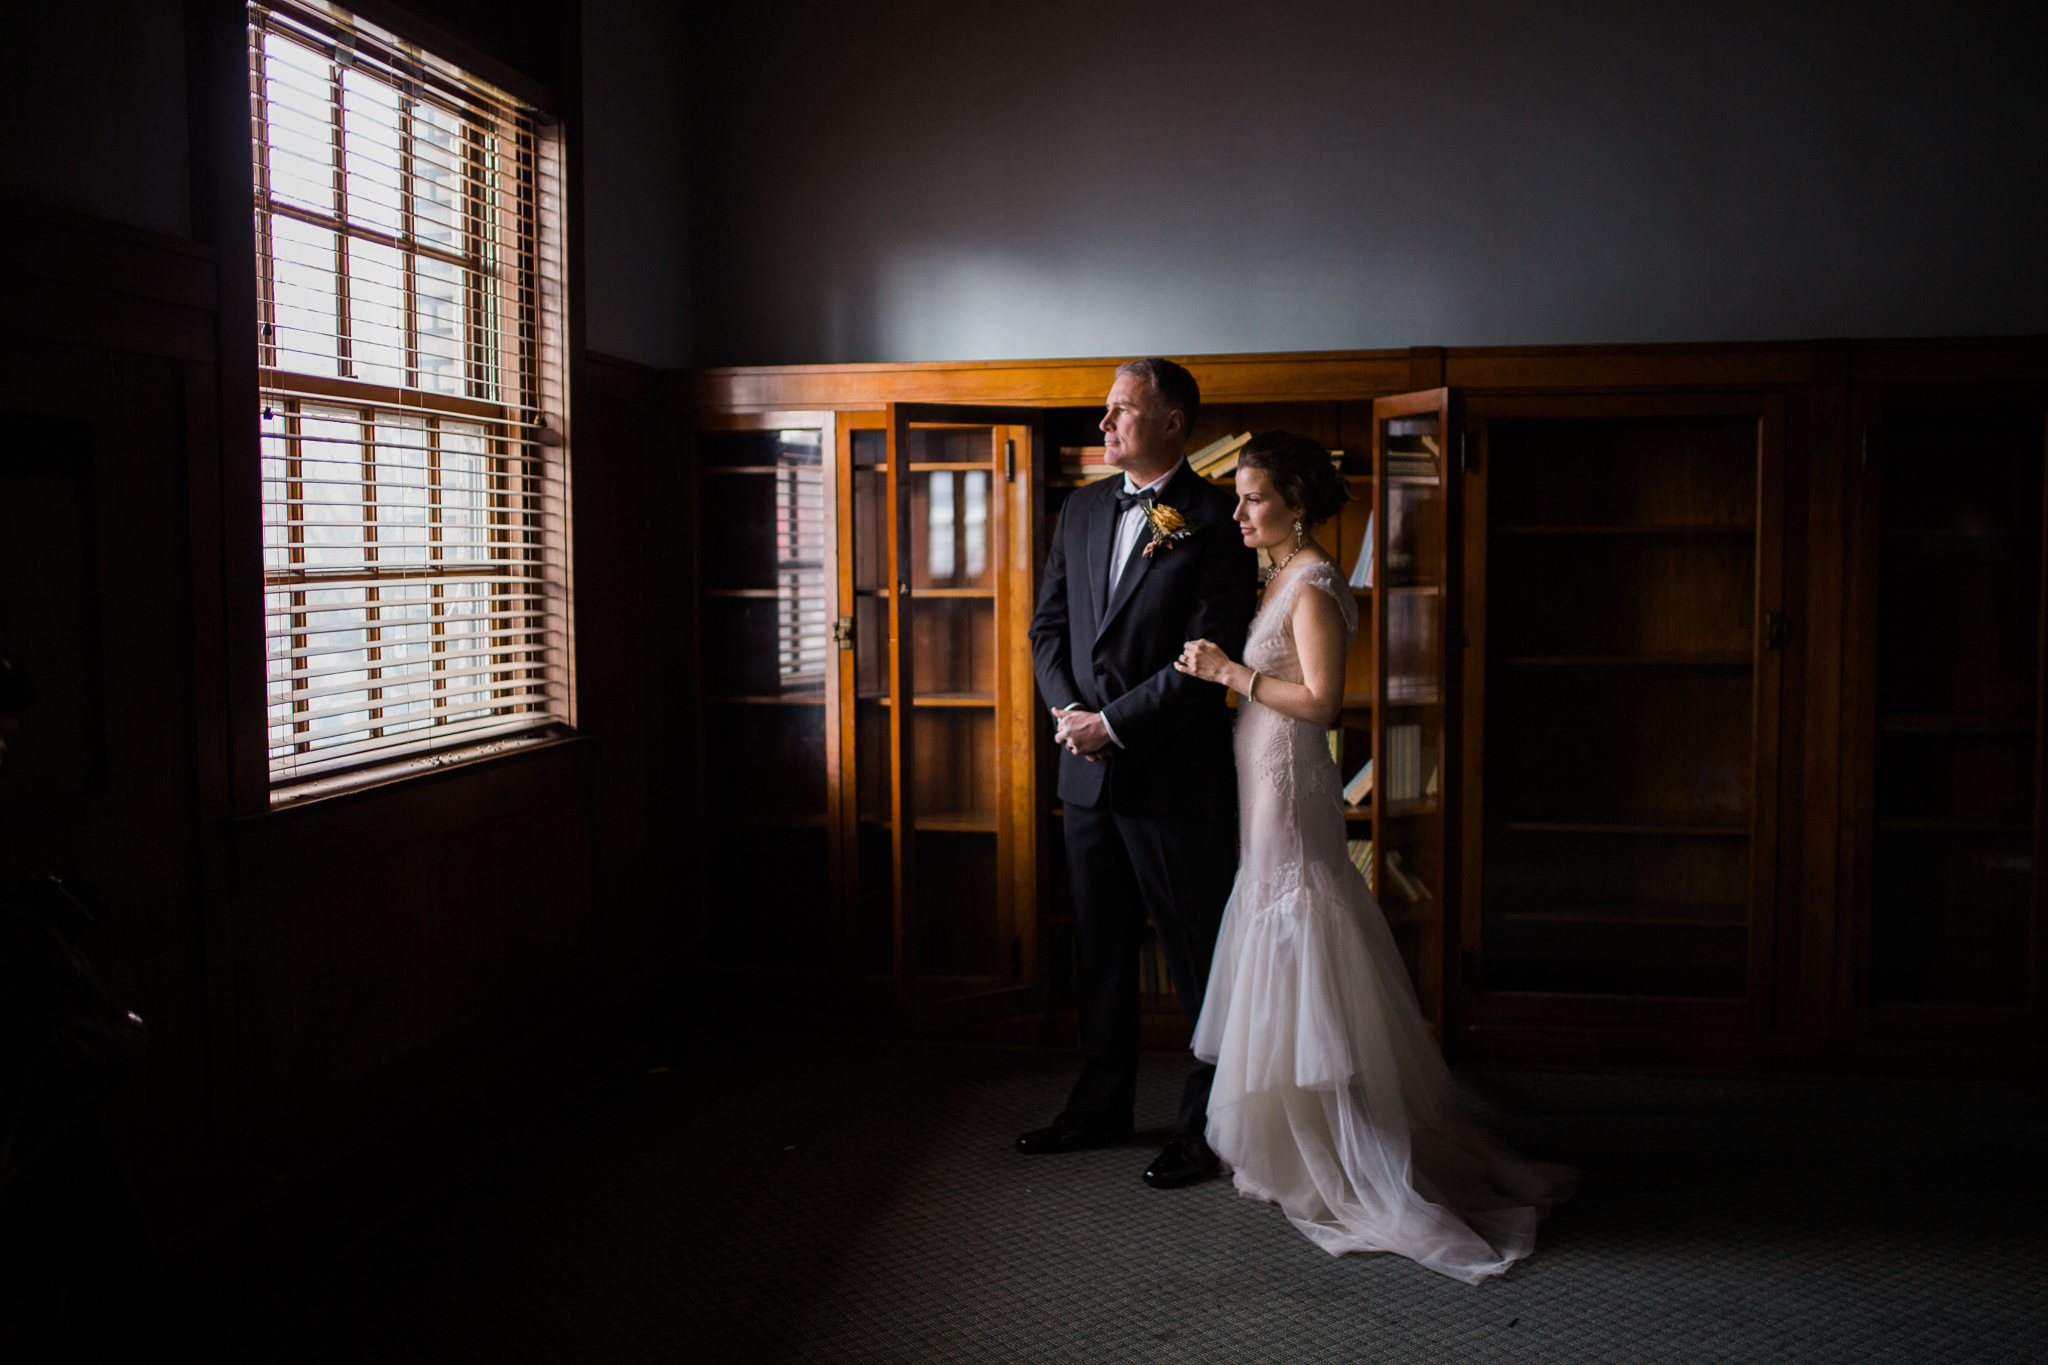 Classic Bride and Groom photo Vancouver, Washington wedding photographer